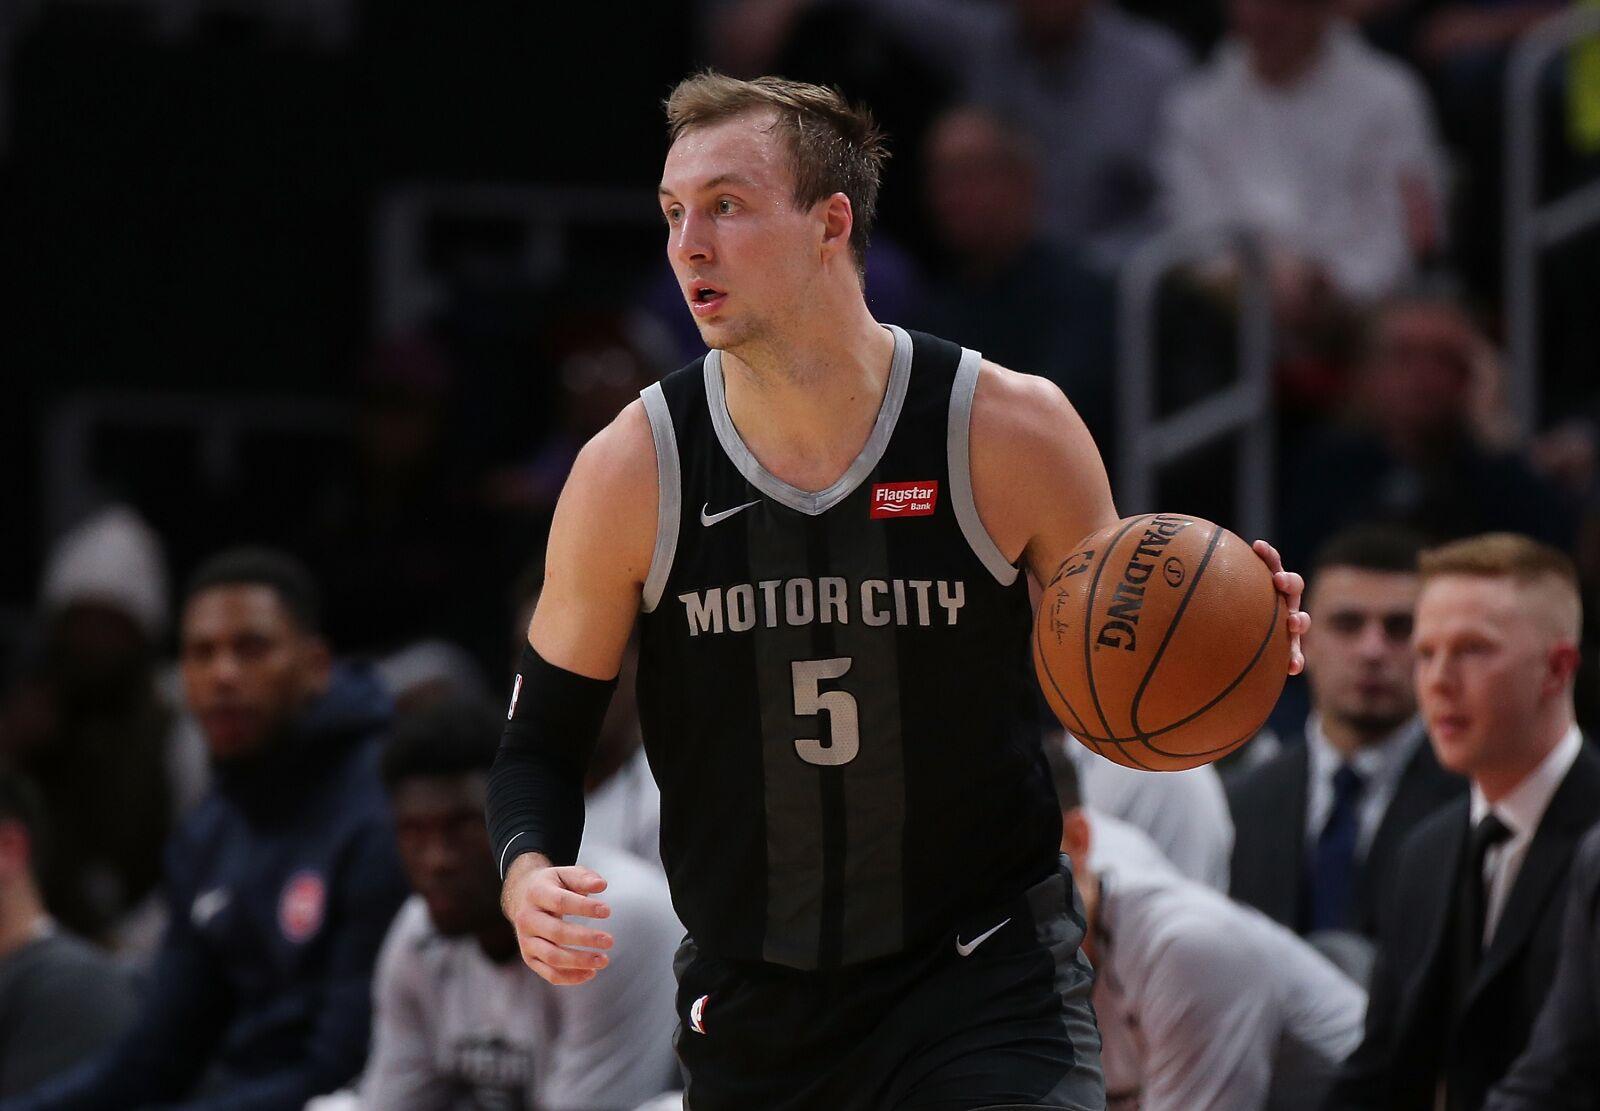 Luke Kennard aggressiveness biggest takeaway from recent Pistons stretch